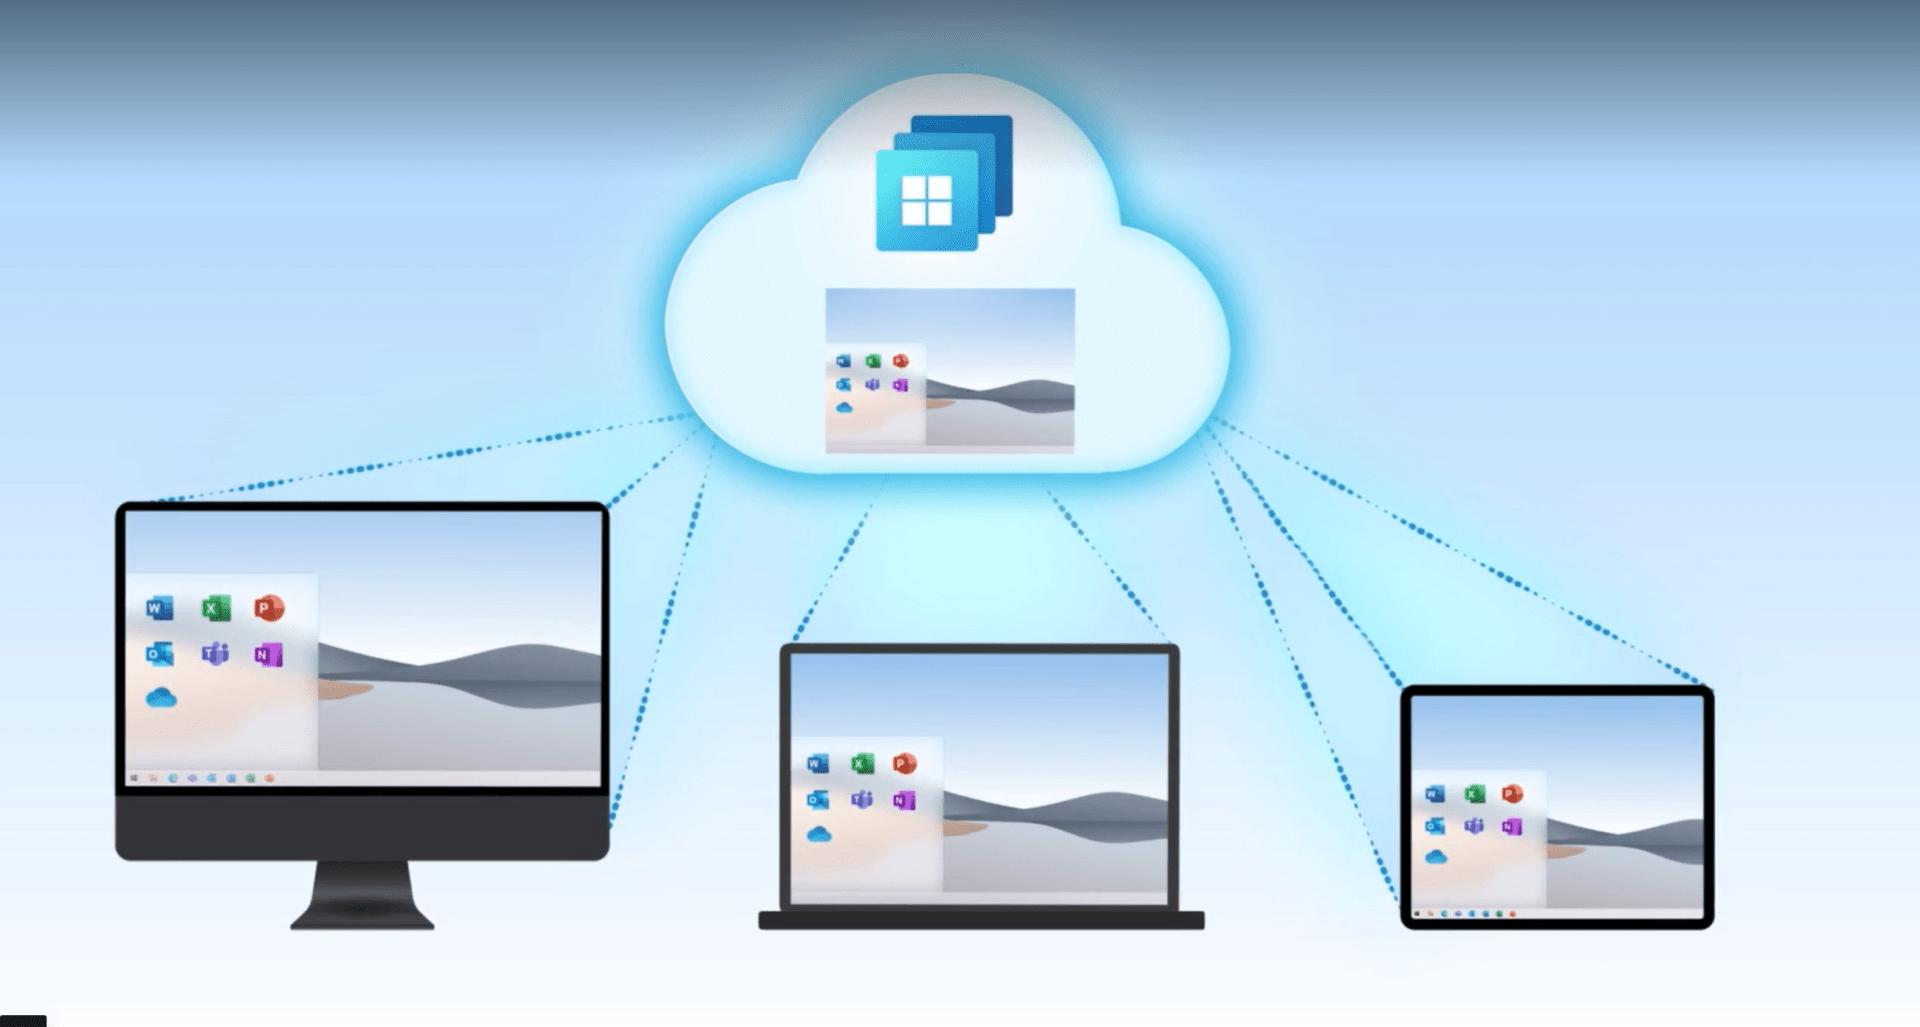 Windows 365 in the Cloud